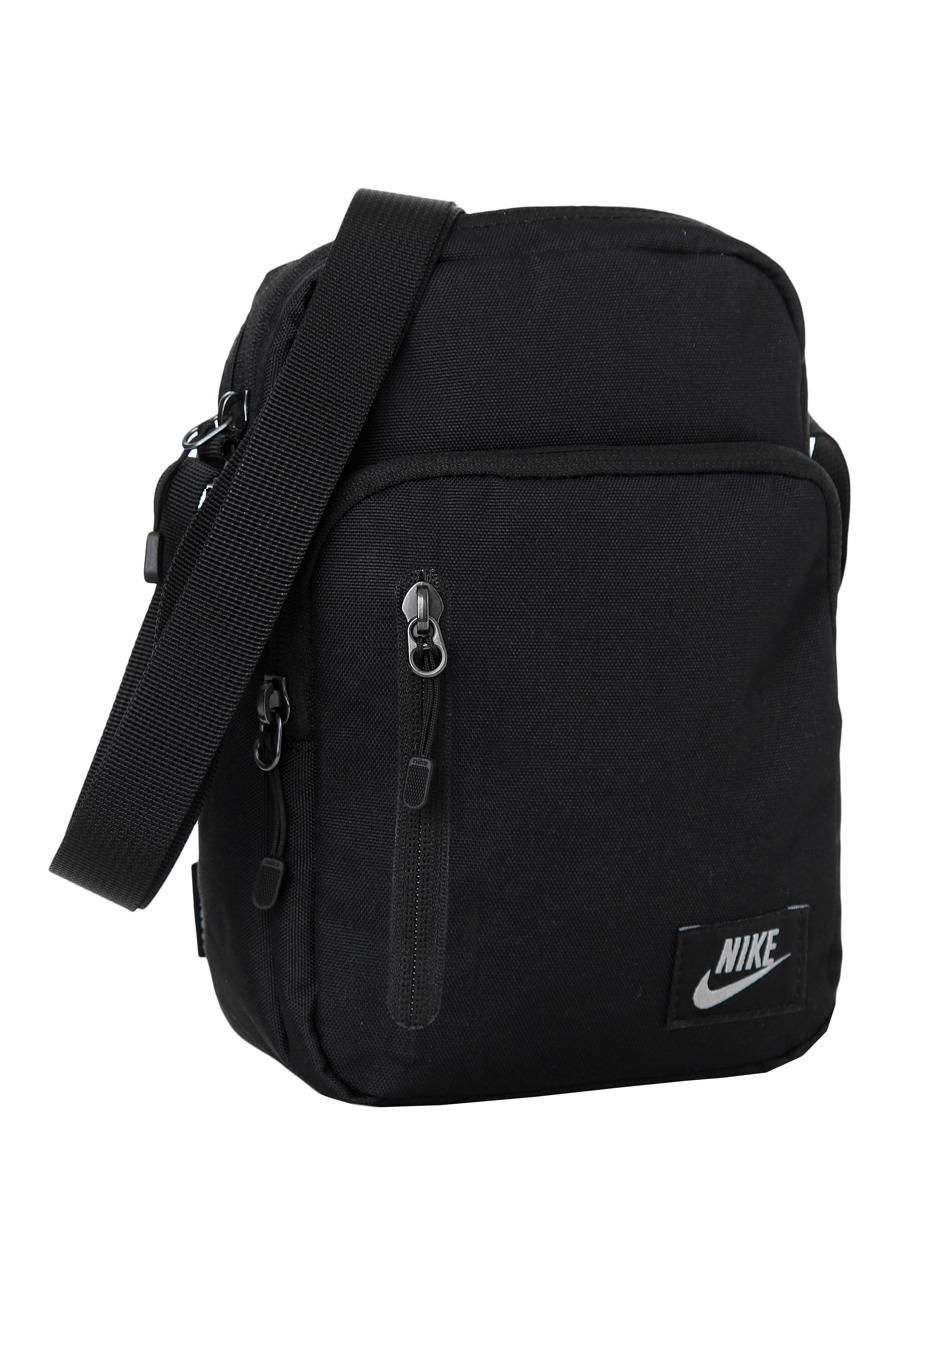 Nike Core Small Items Ii Black Silver Bag Streetwear Impericon Uk